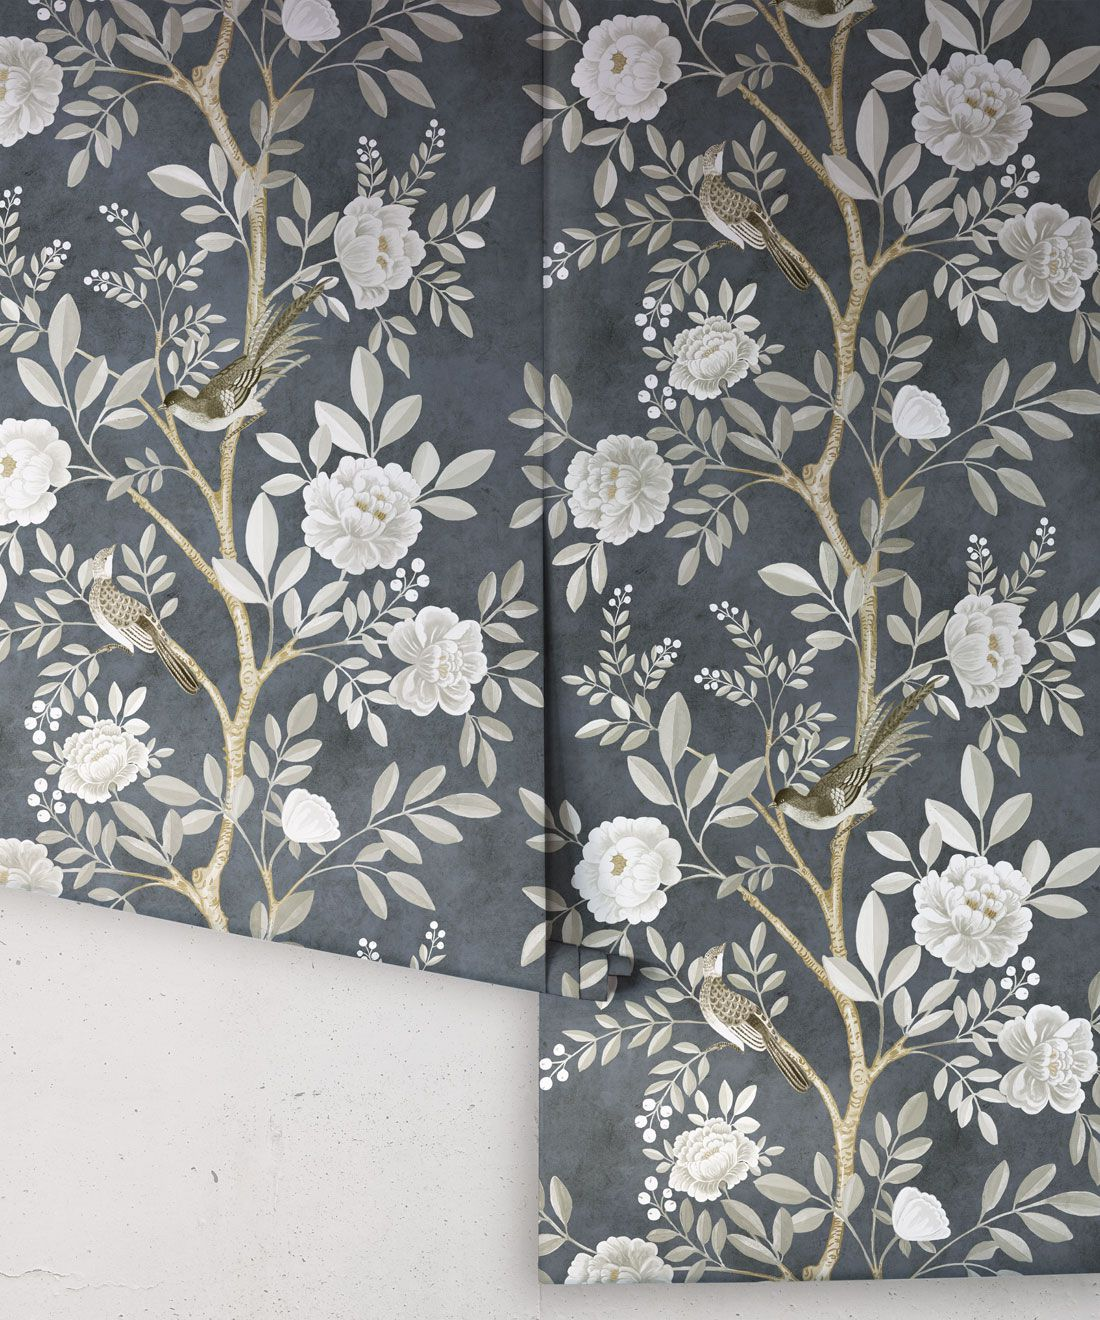 Chinoiserie Wallpaper •Floral Wallpaper •Bird Wallpaper • Magnolia • Navy • Rolls